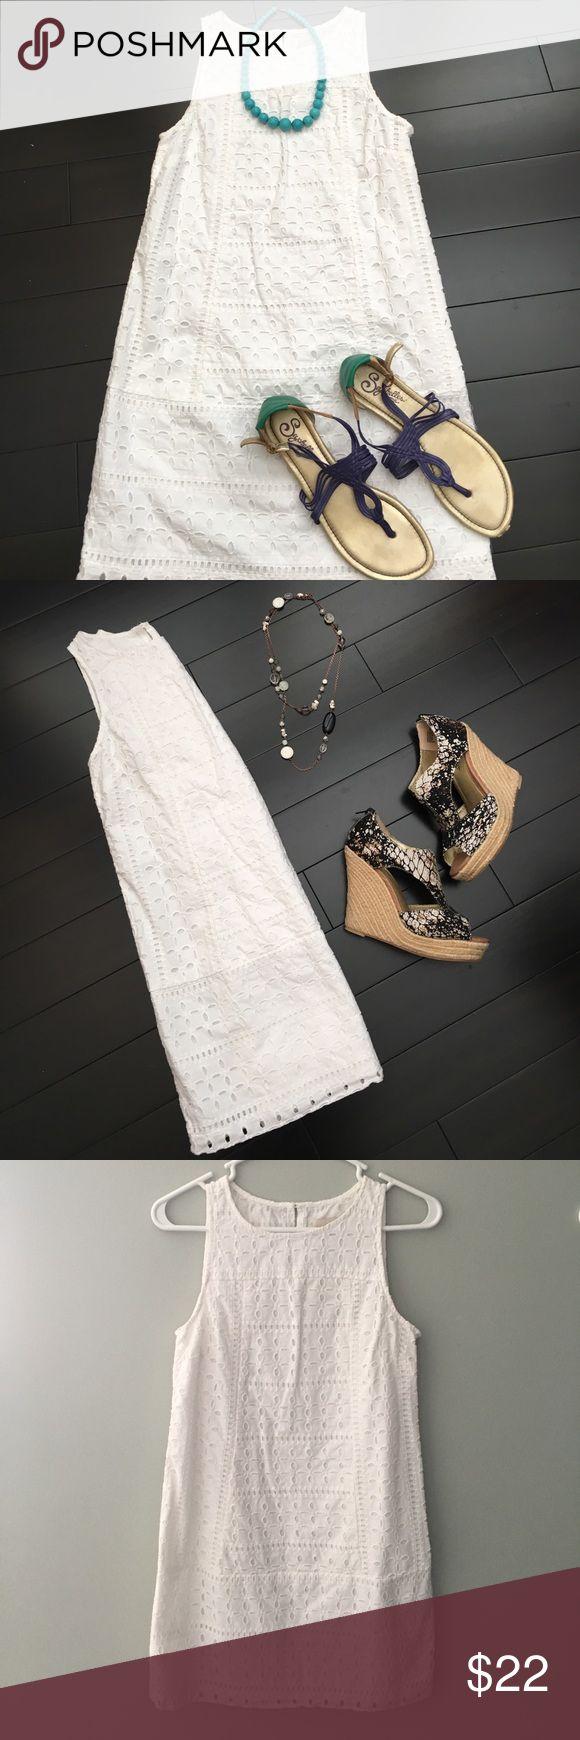 LOFT White Eyelet Dress Great summer shift dress, perfect for graduations, showers, and weddings. Hits mid thigh. LOFT Dresses Mini